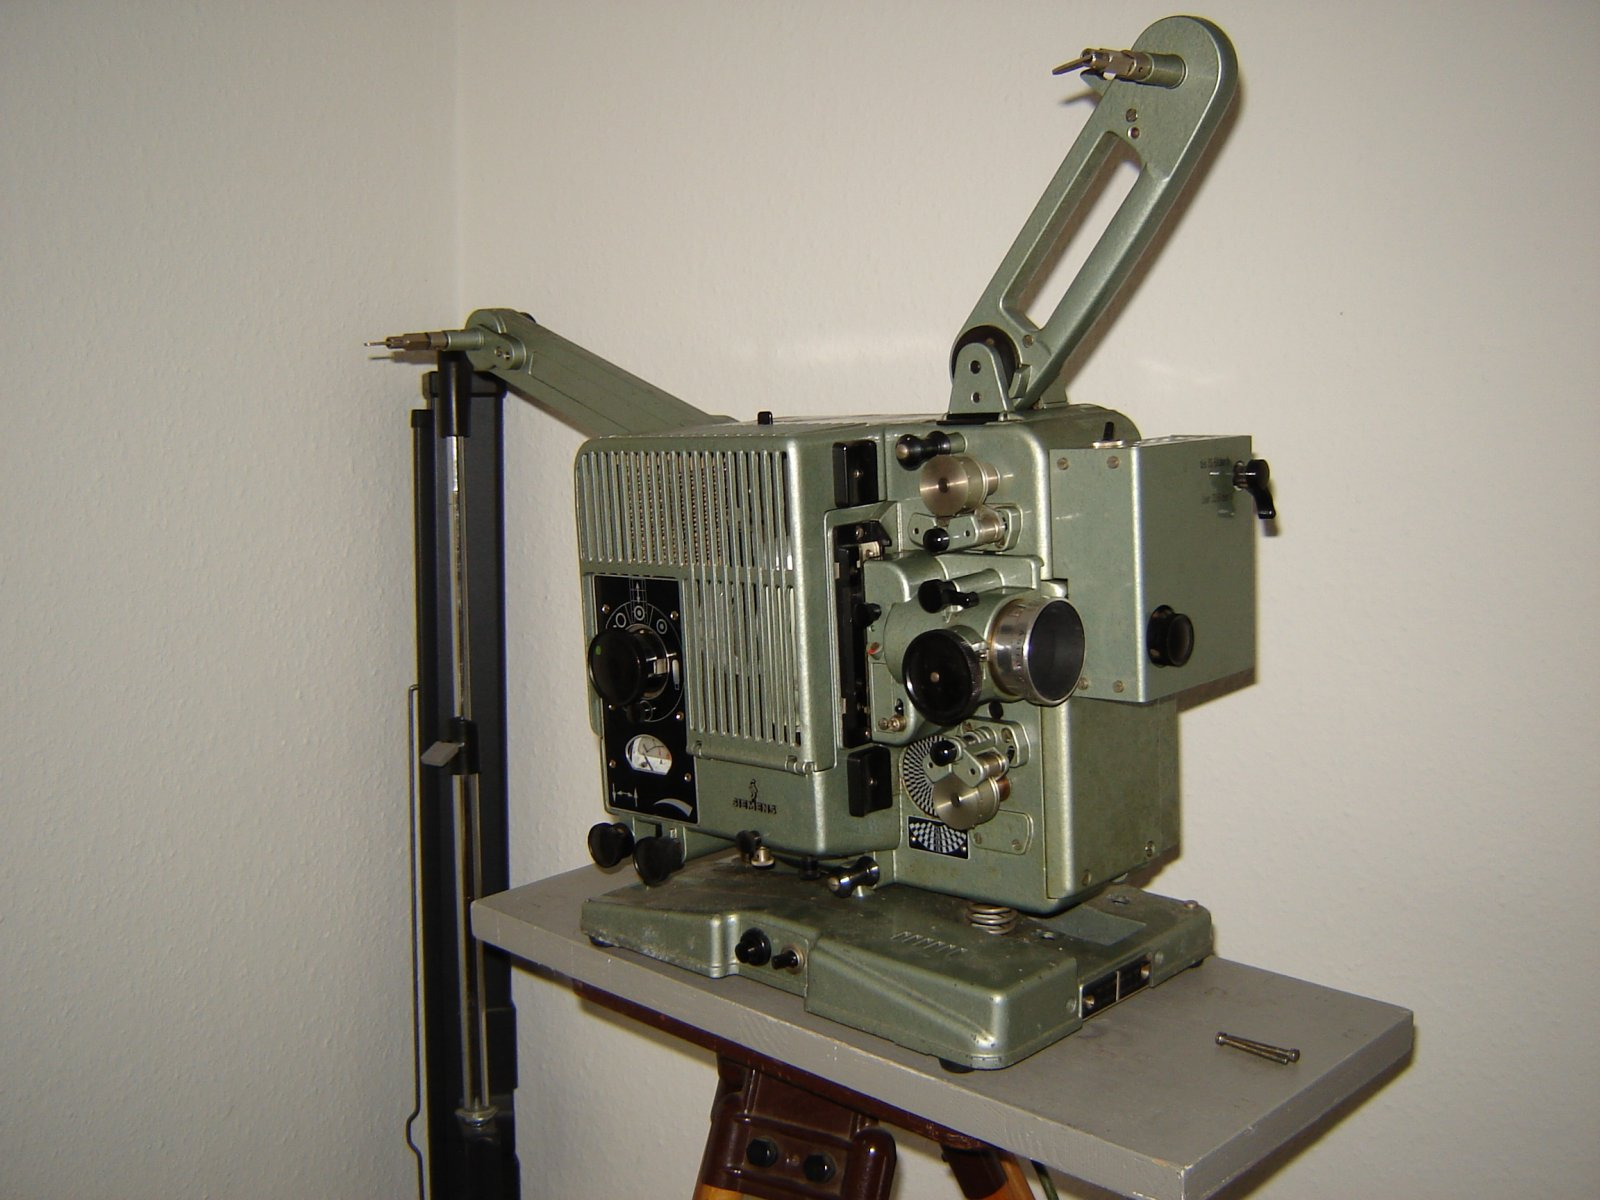 Siemens 2000, stumm